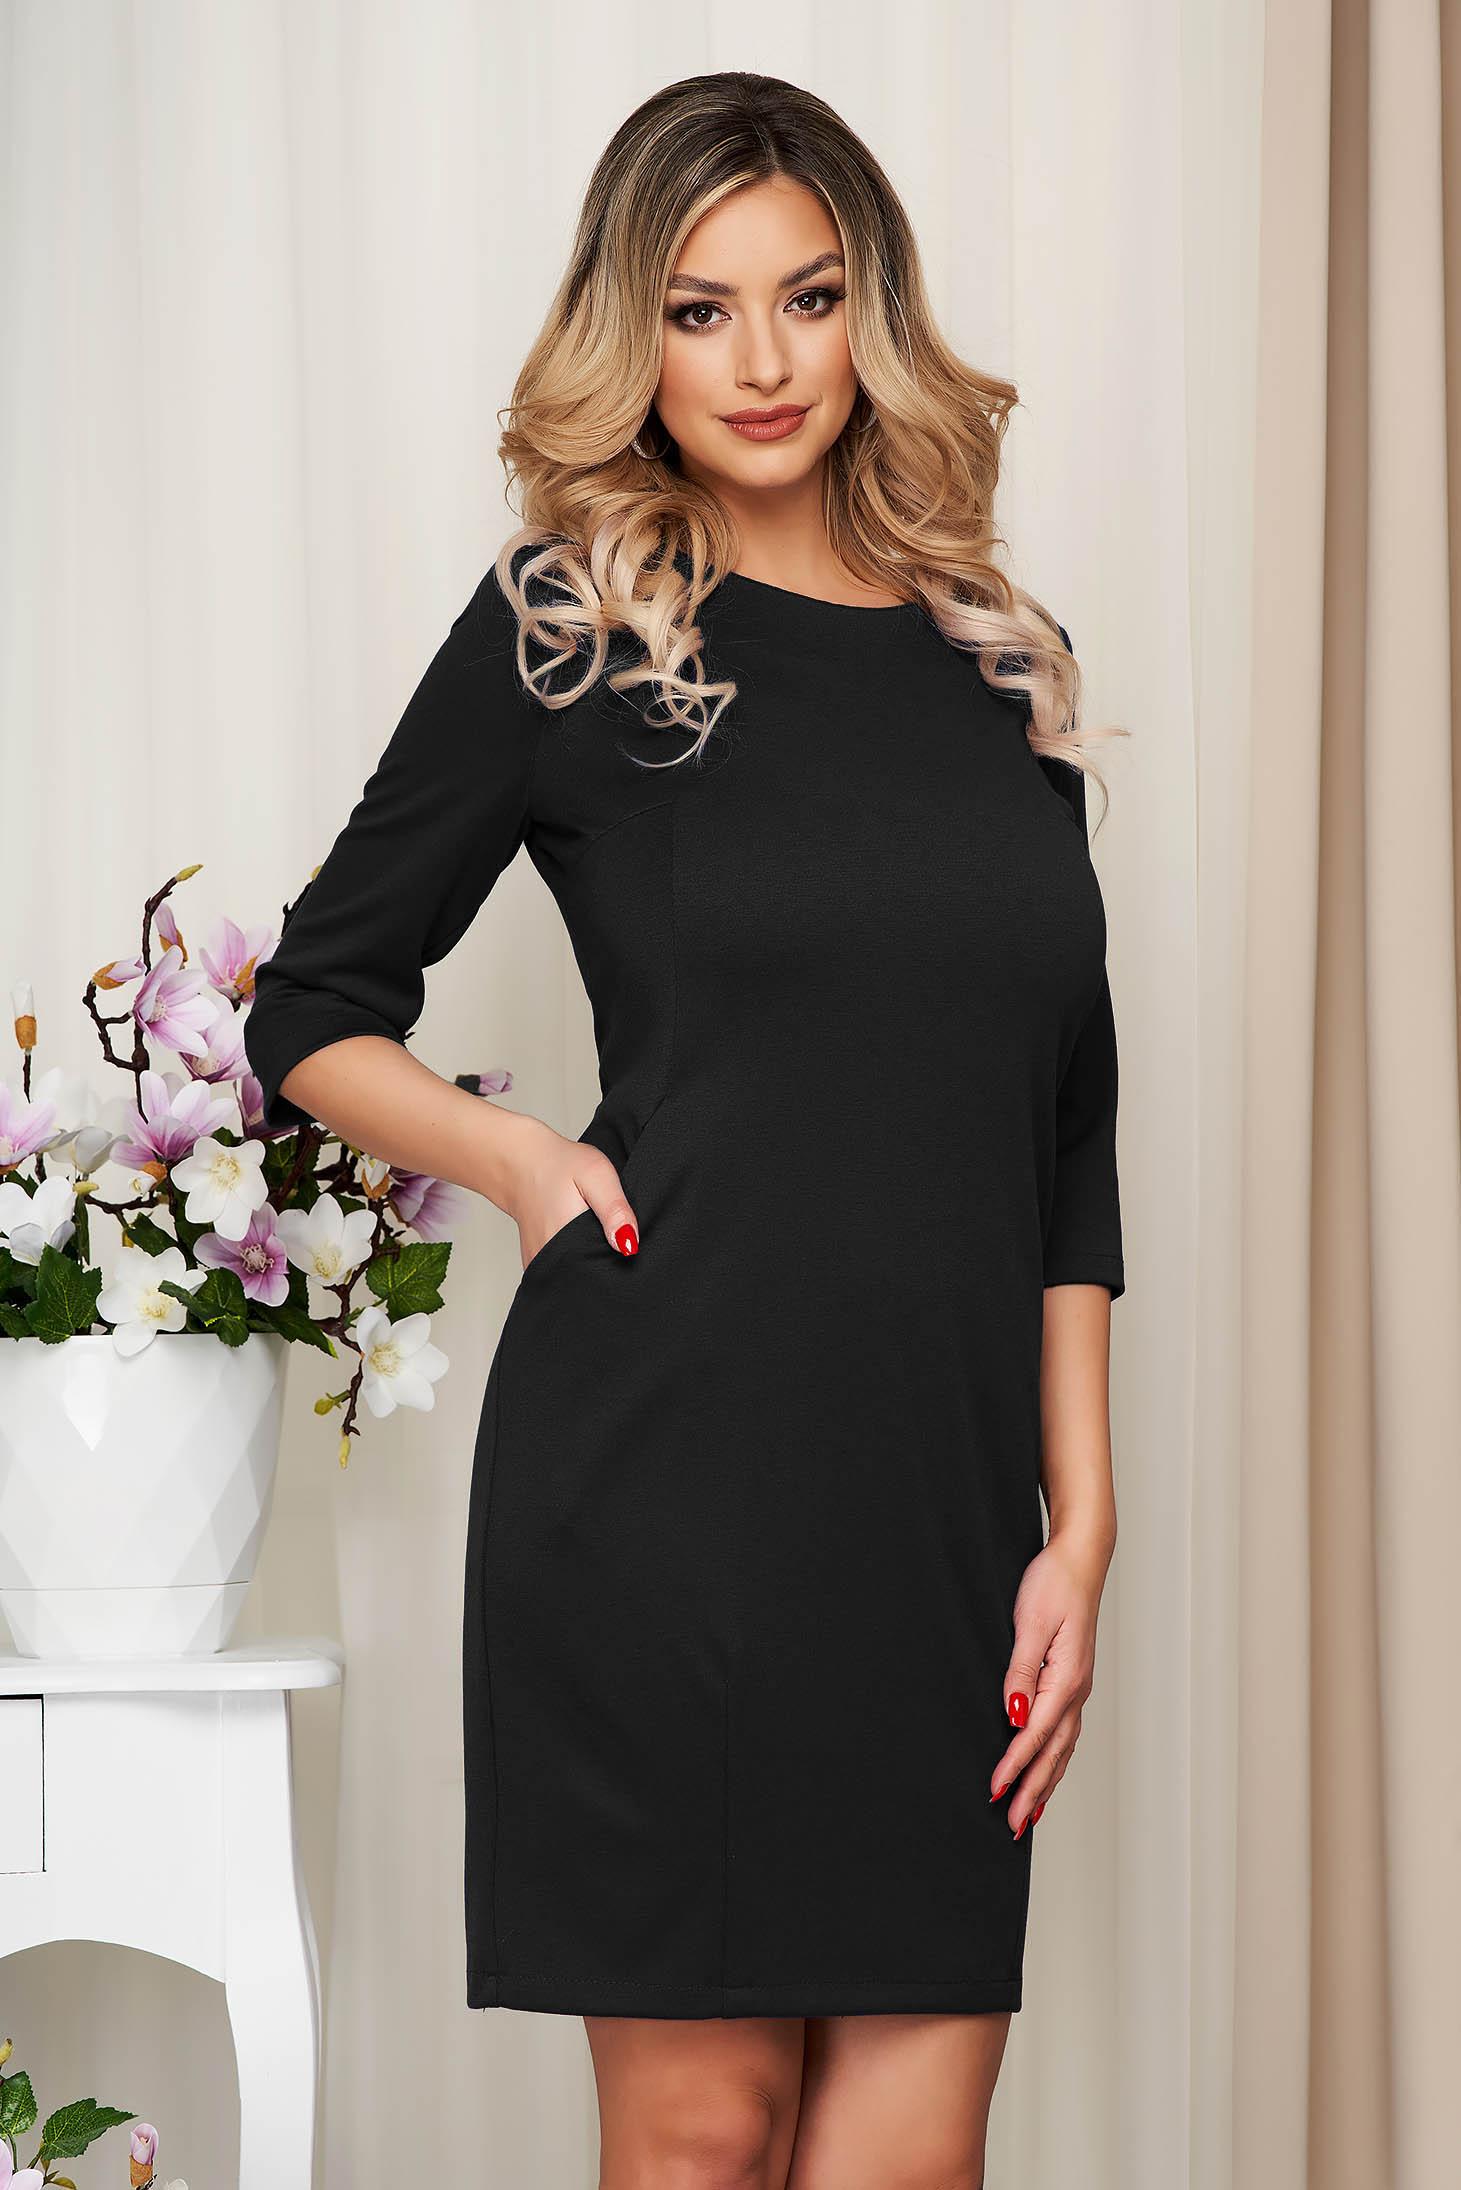 Dress black office slightly elastic fabric straight with pockets